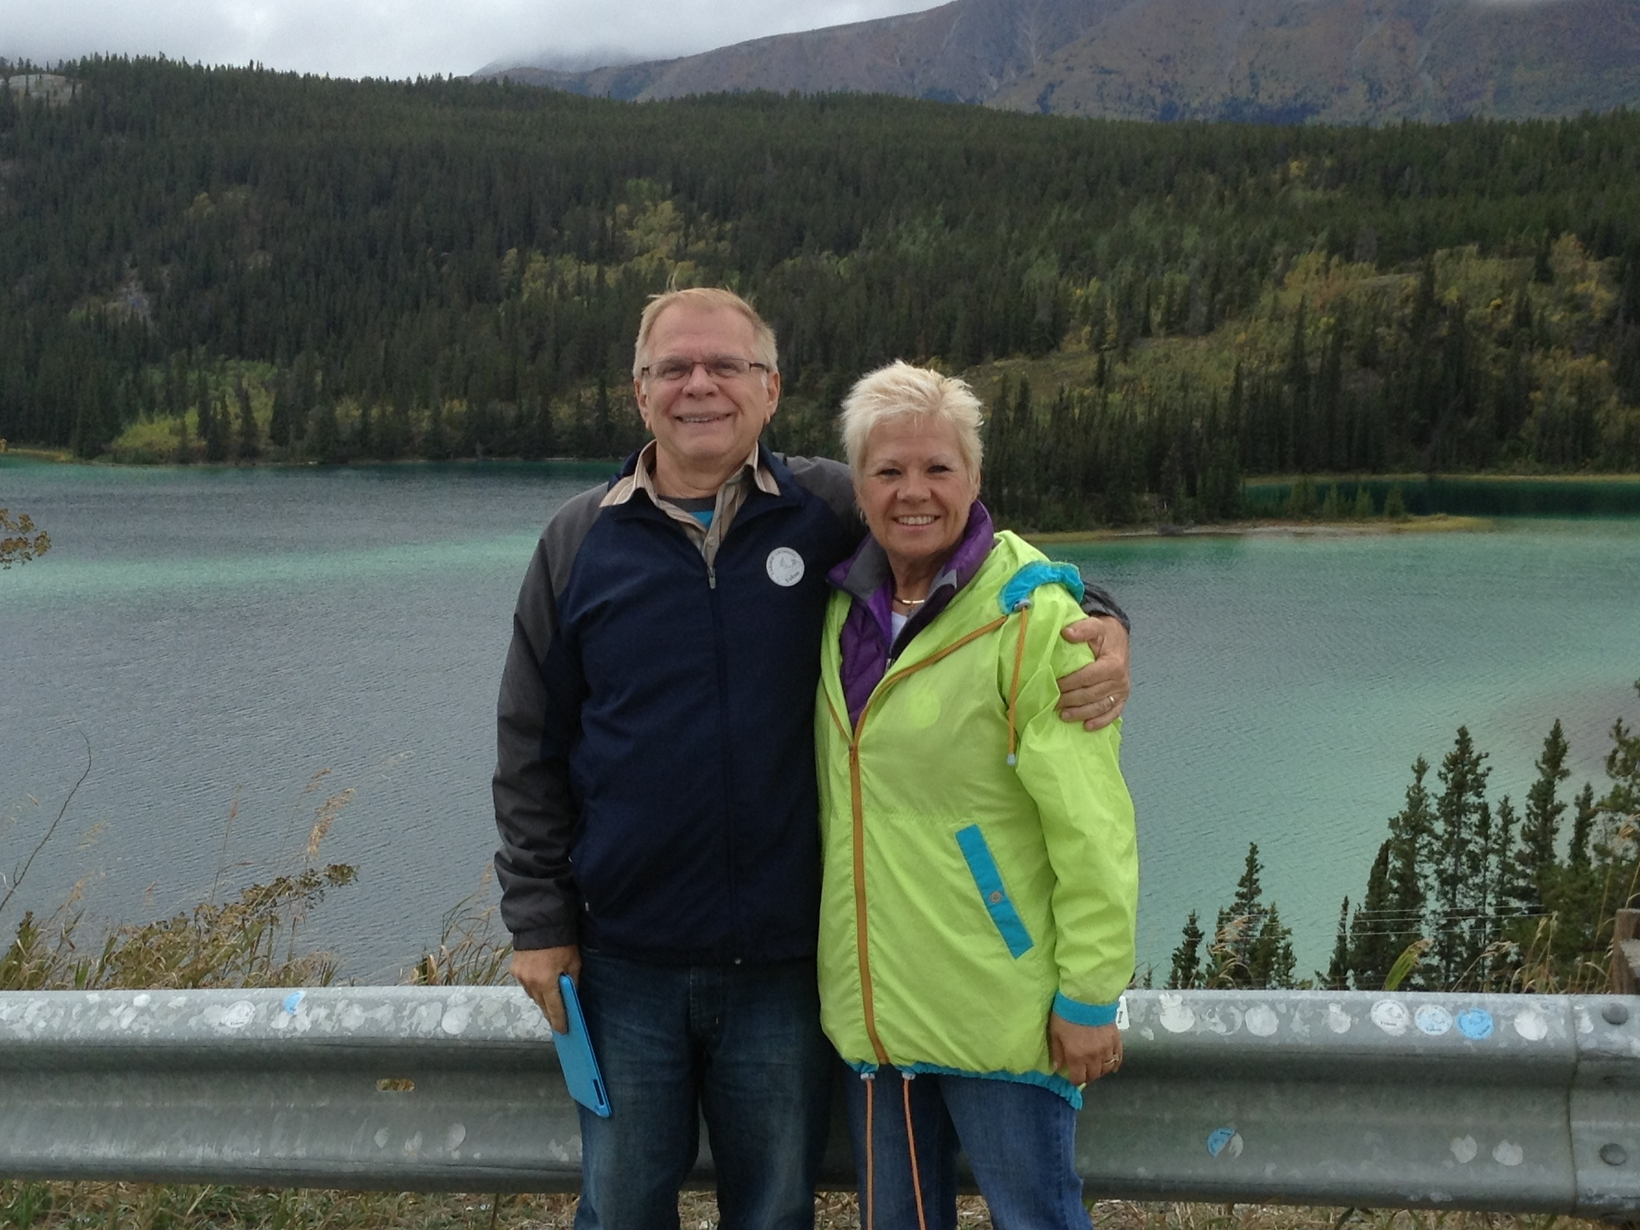 Donna & Scott from Kingston, Ontario, Canada